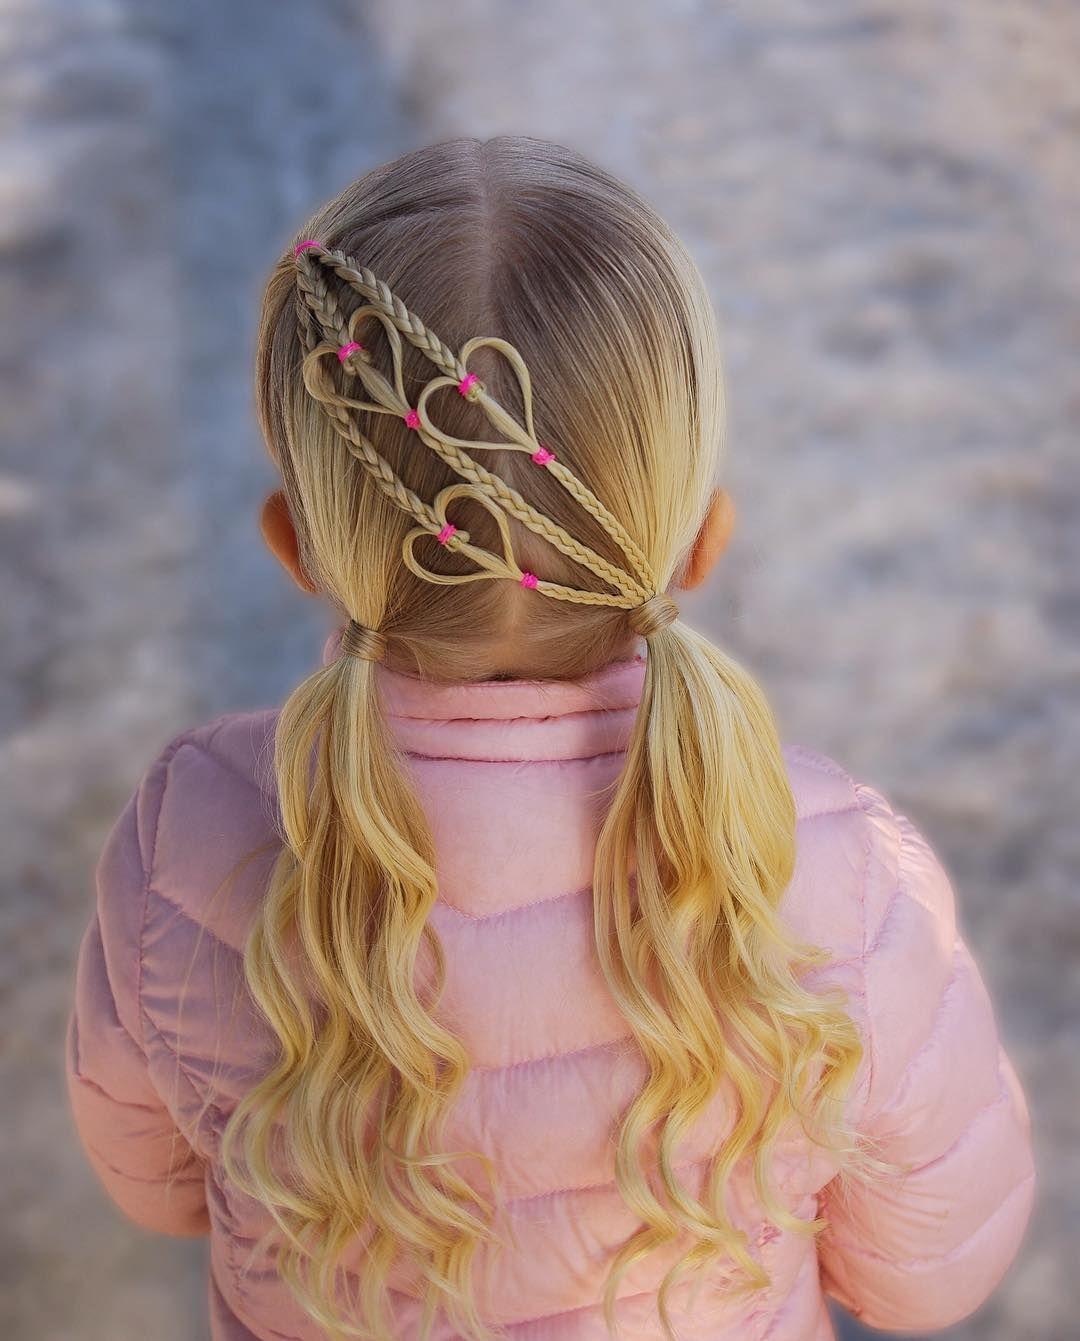 Pin by kiera on hairstylesnaturalbraids u weaveus in